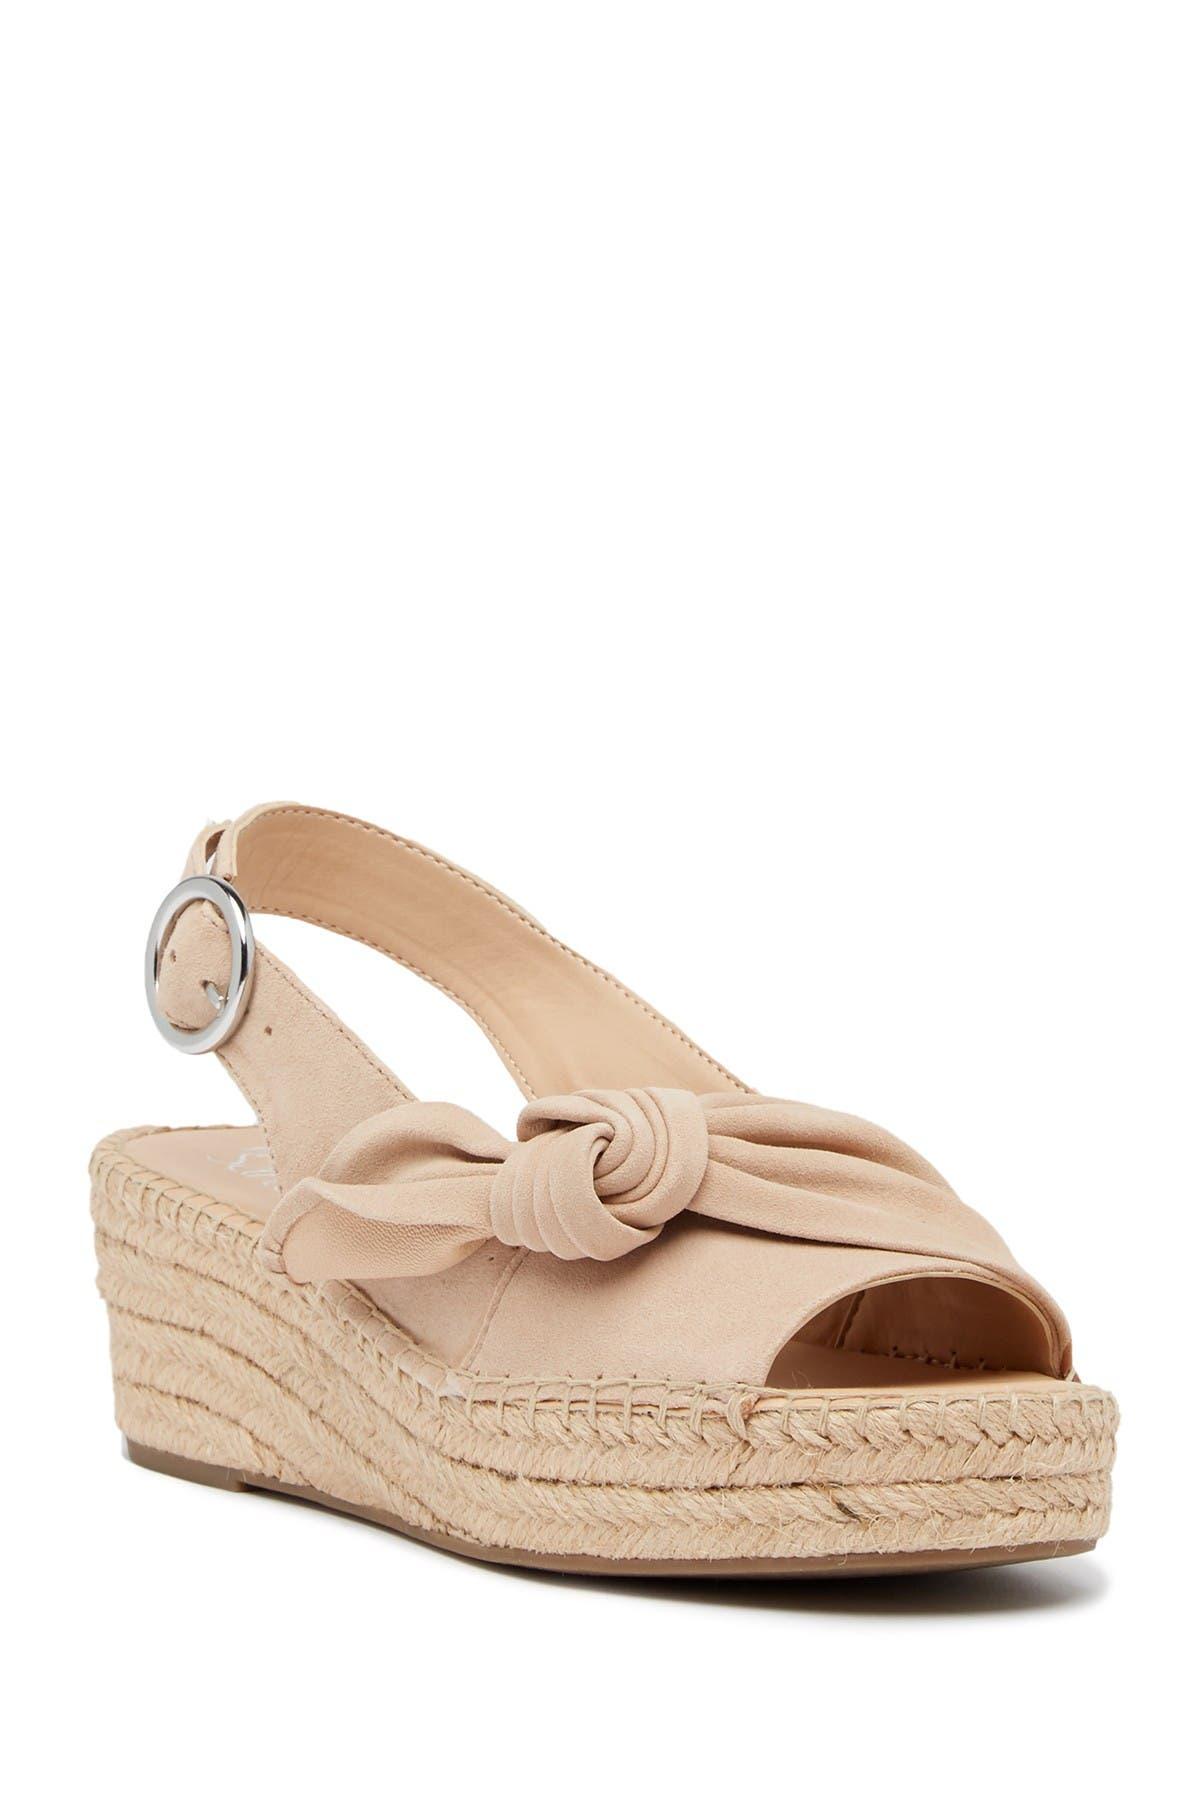 Pixie Suede Slingback Wedge Sandal